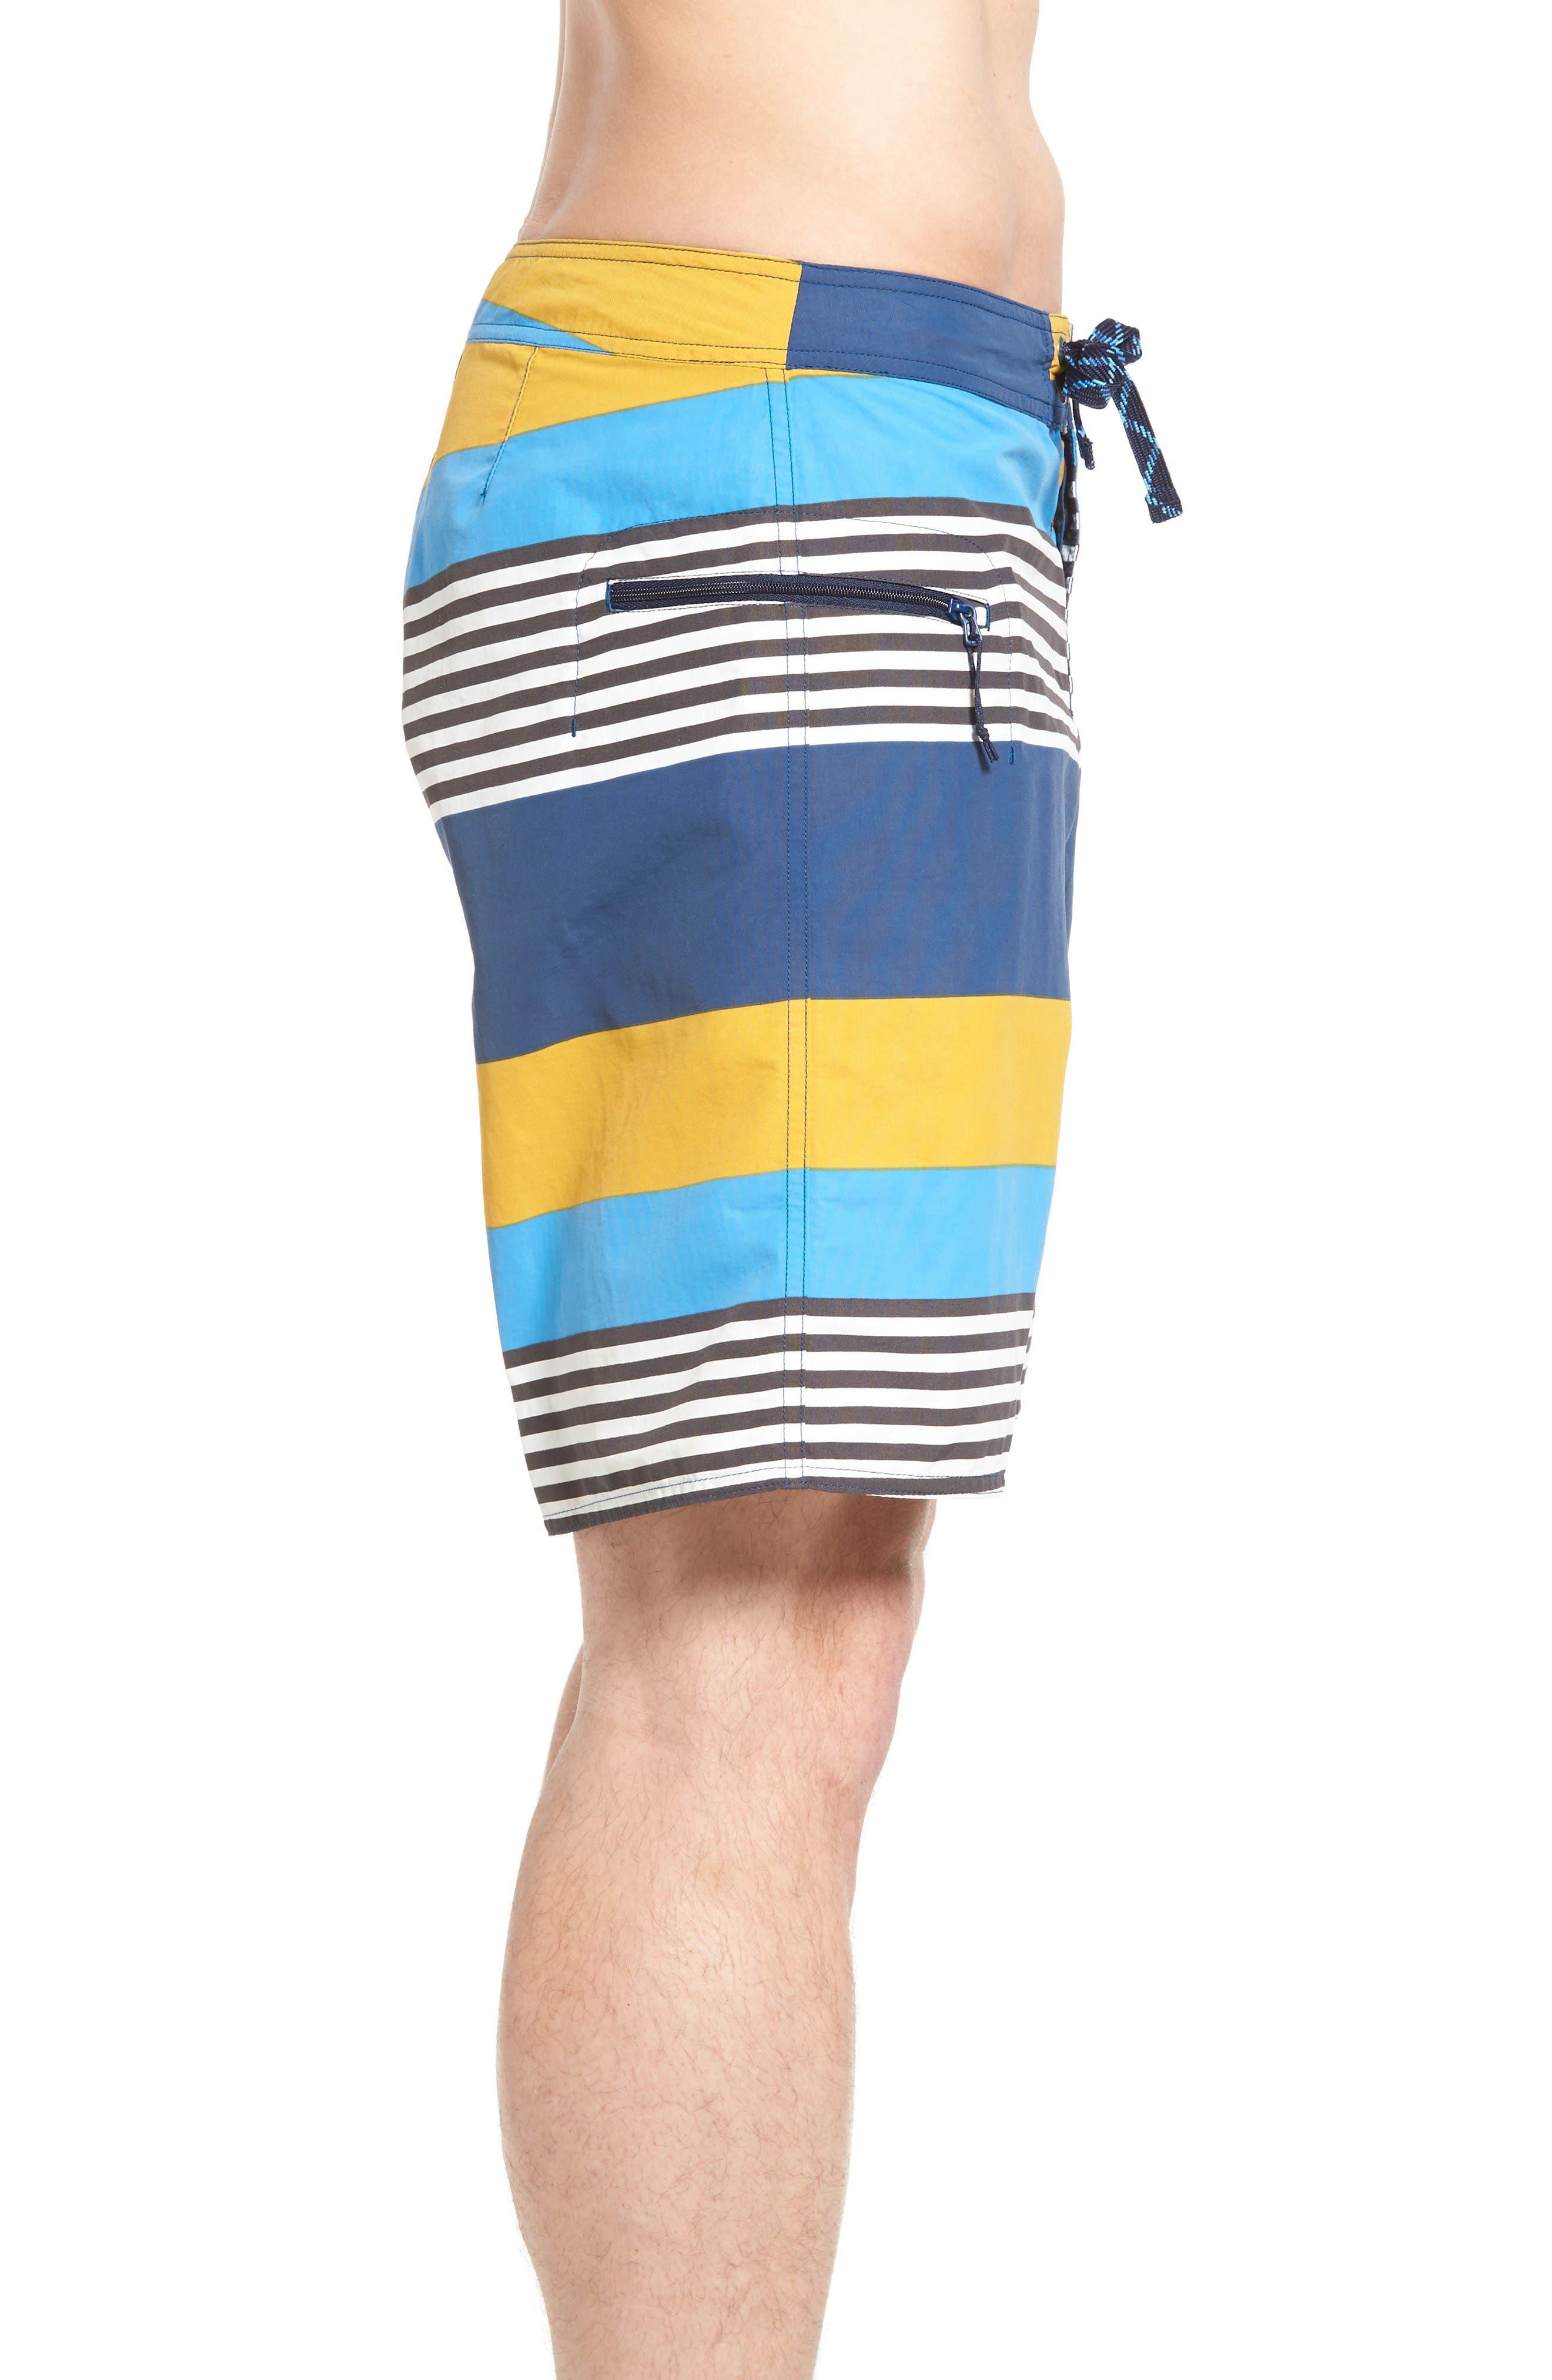 Wavefarer Board Shorts,                             Alternate thumbnail 3, color,                             Yurt Yellow